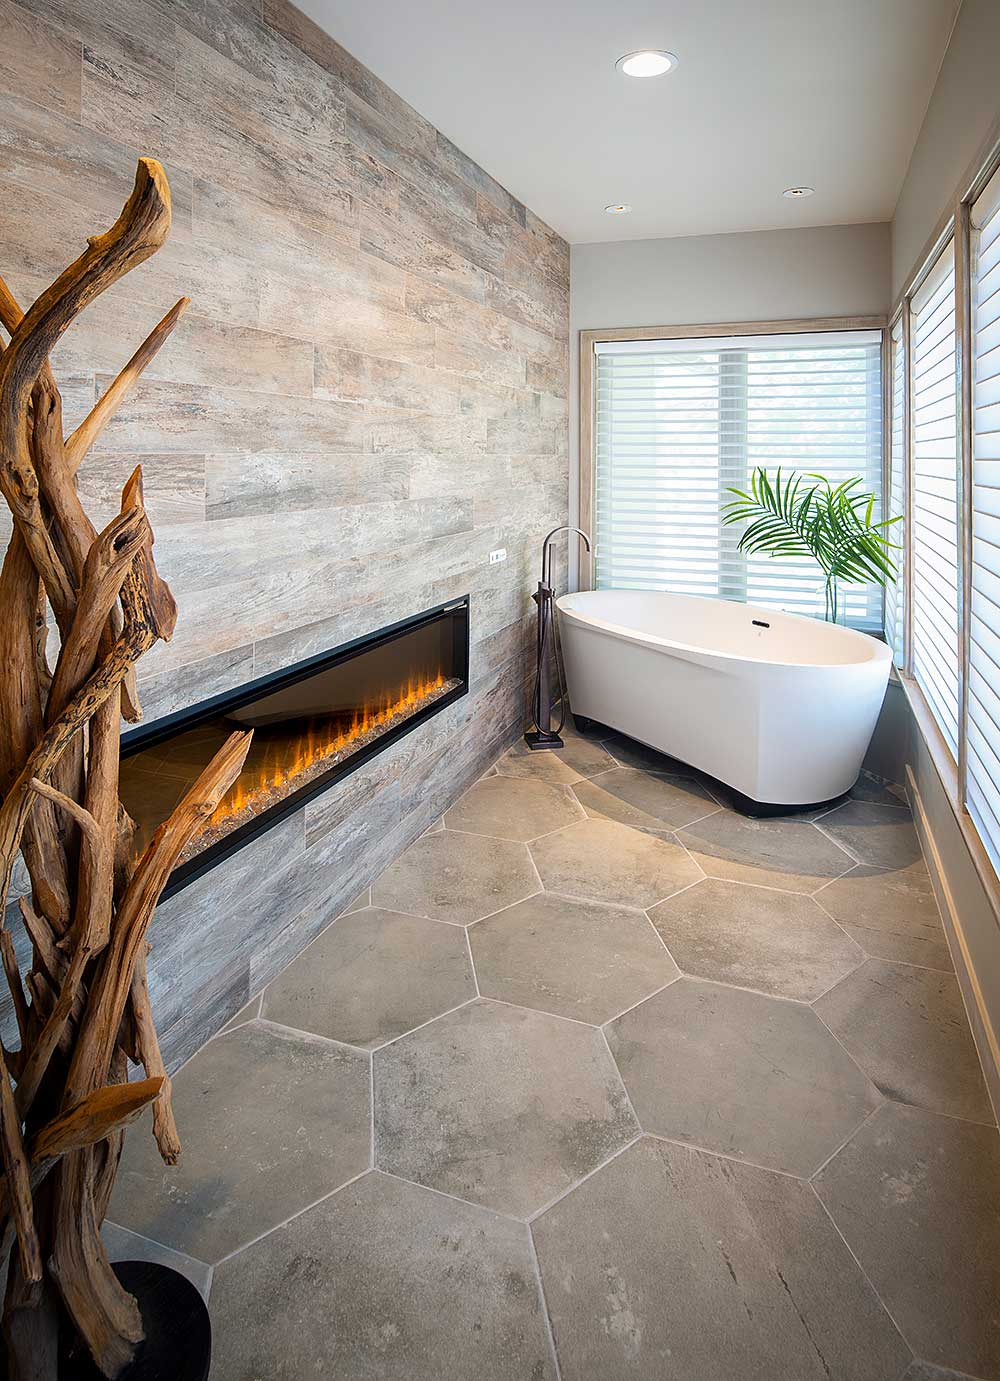 Luxury Bathroom Design With Freestanding Tub